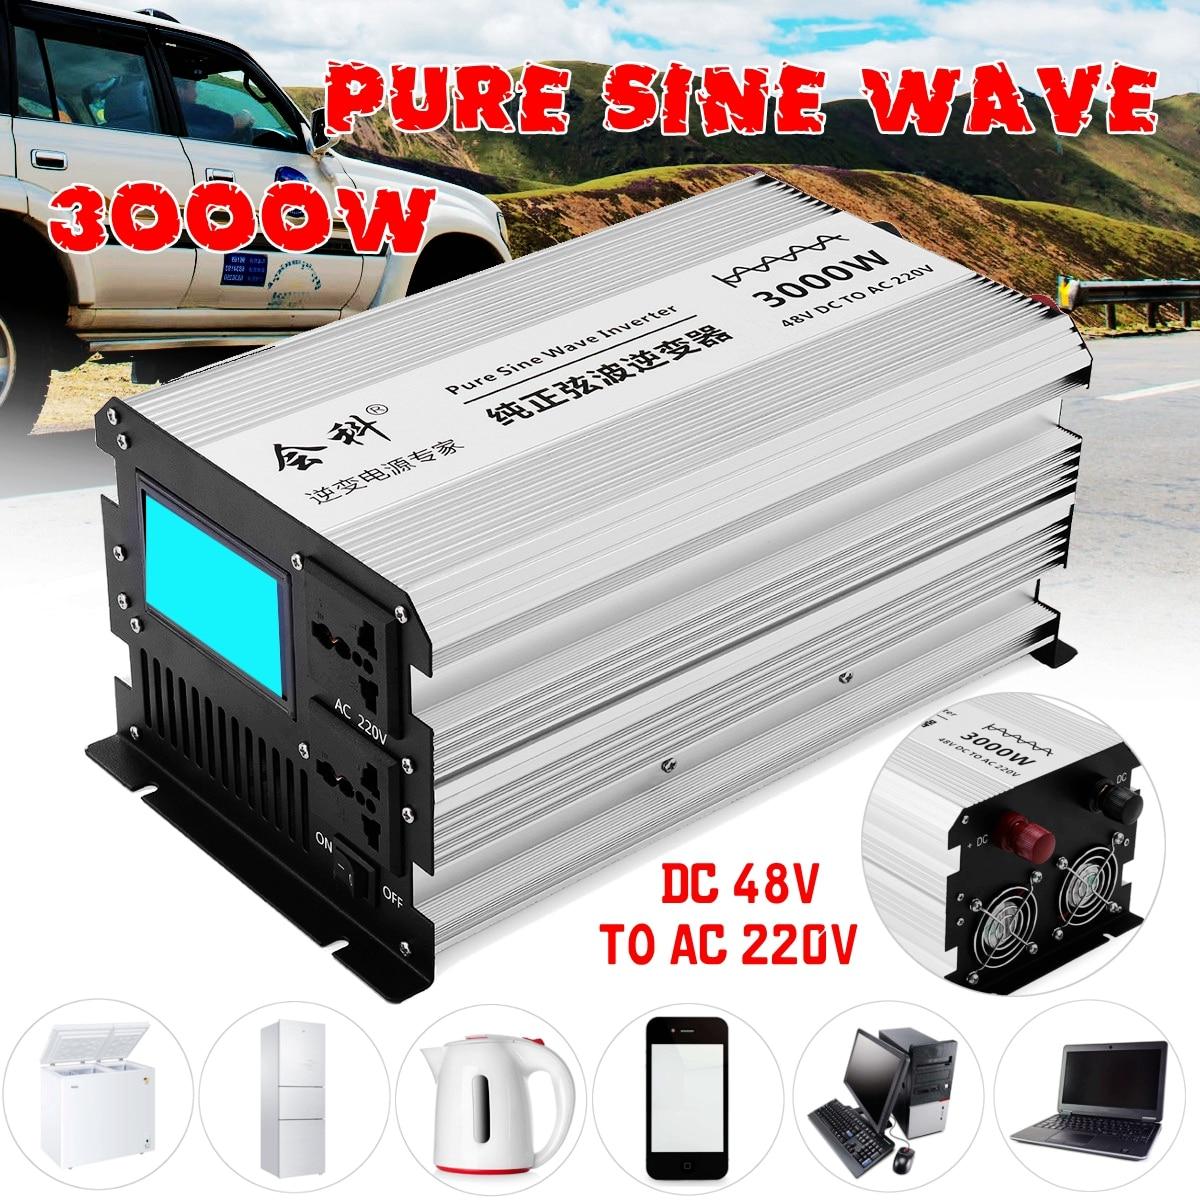 Onduleur onde sinusoïdale pure 1500 W 3000 W Pics 12 v/24 v/48 v à AC110v/ 220 v écran lcd Onduleur alimentation